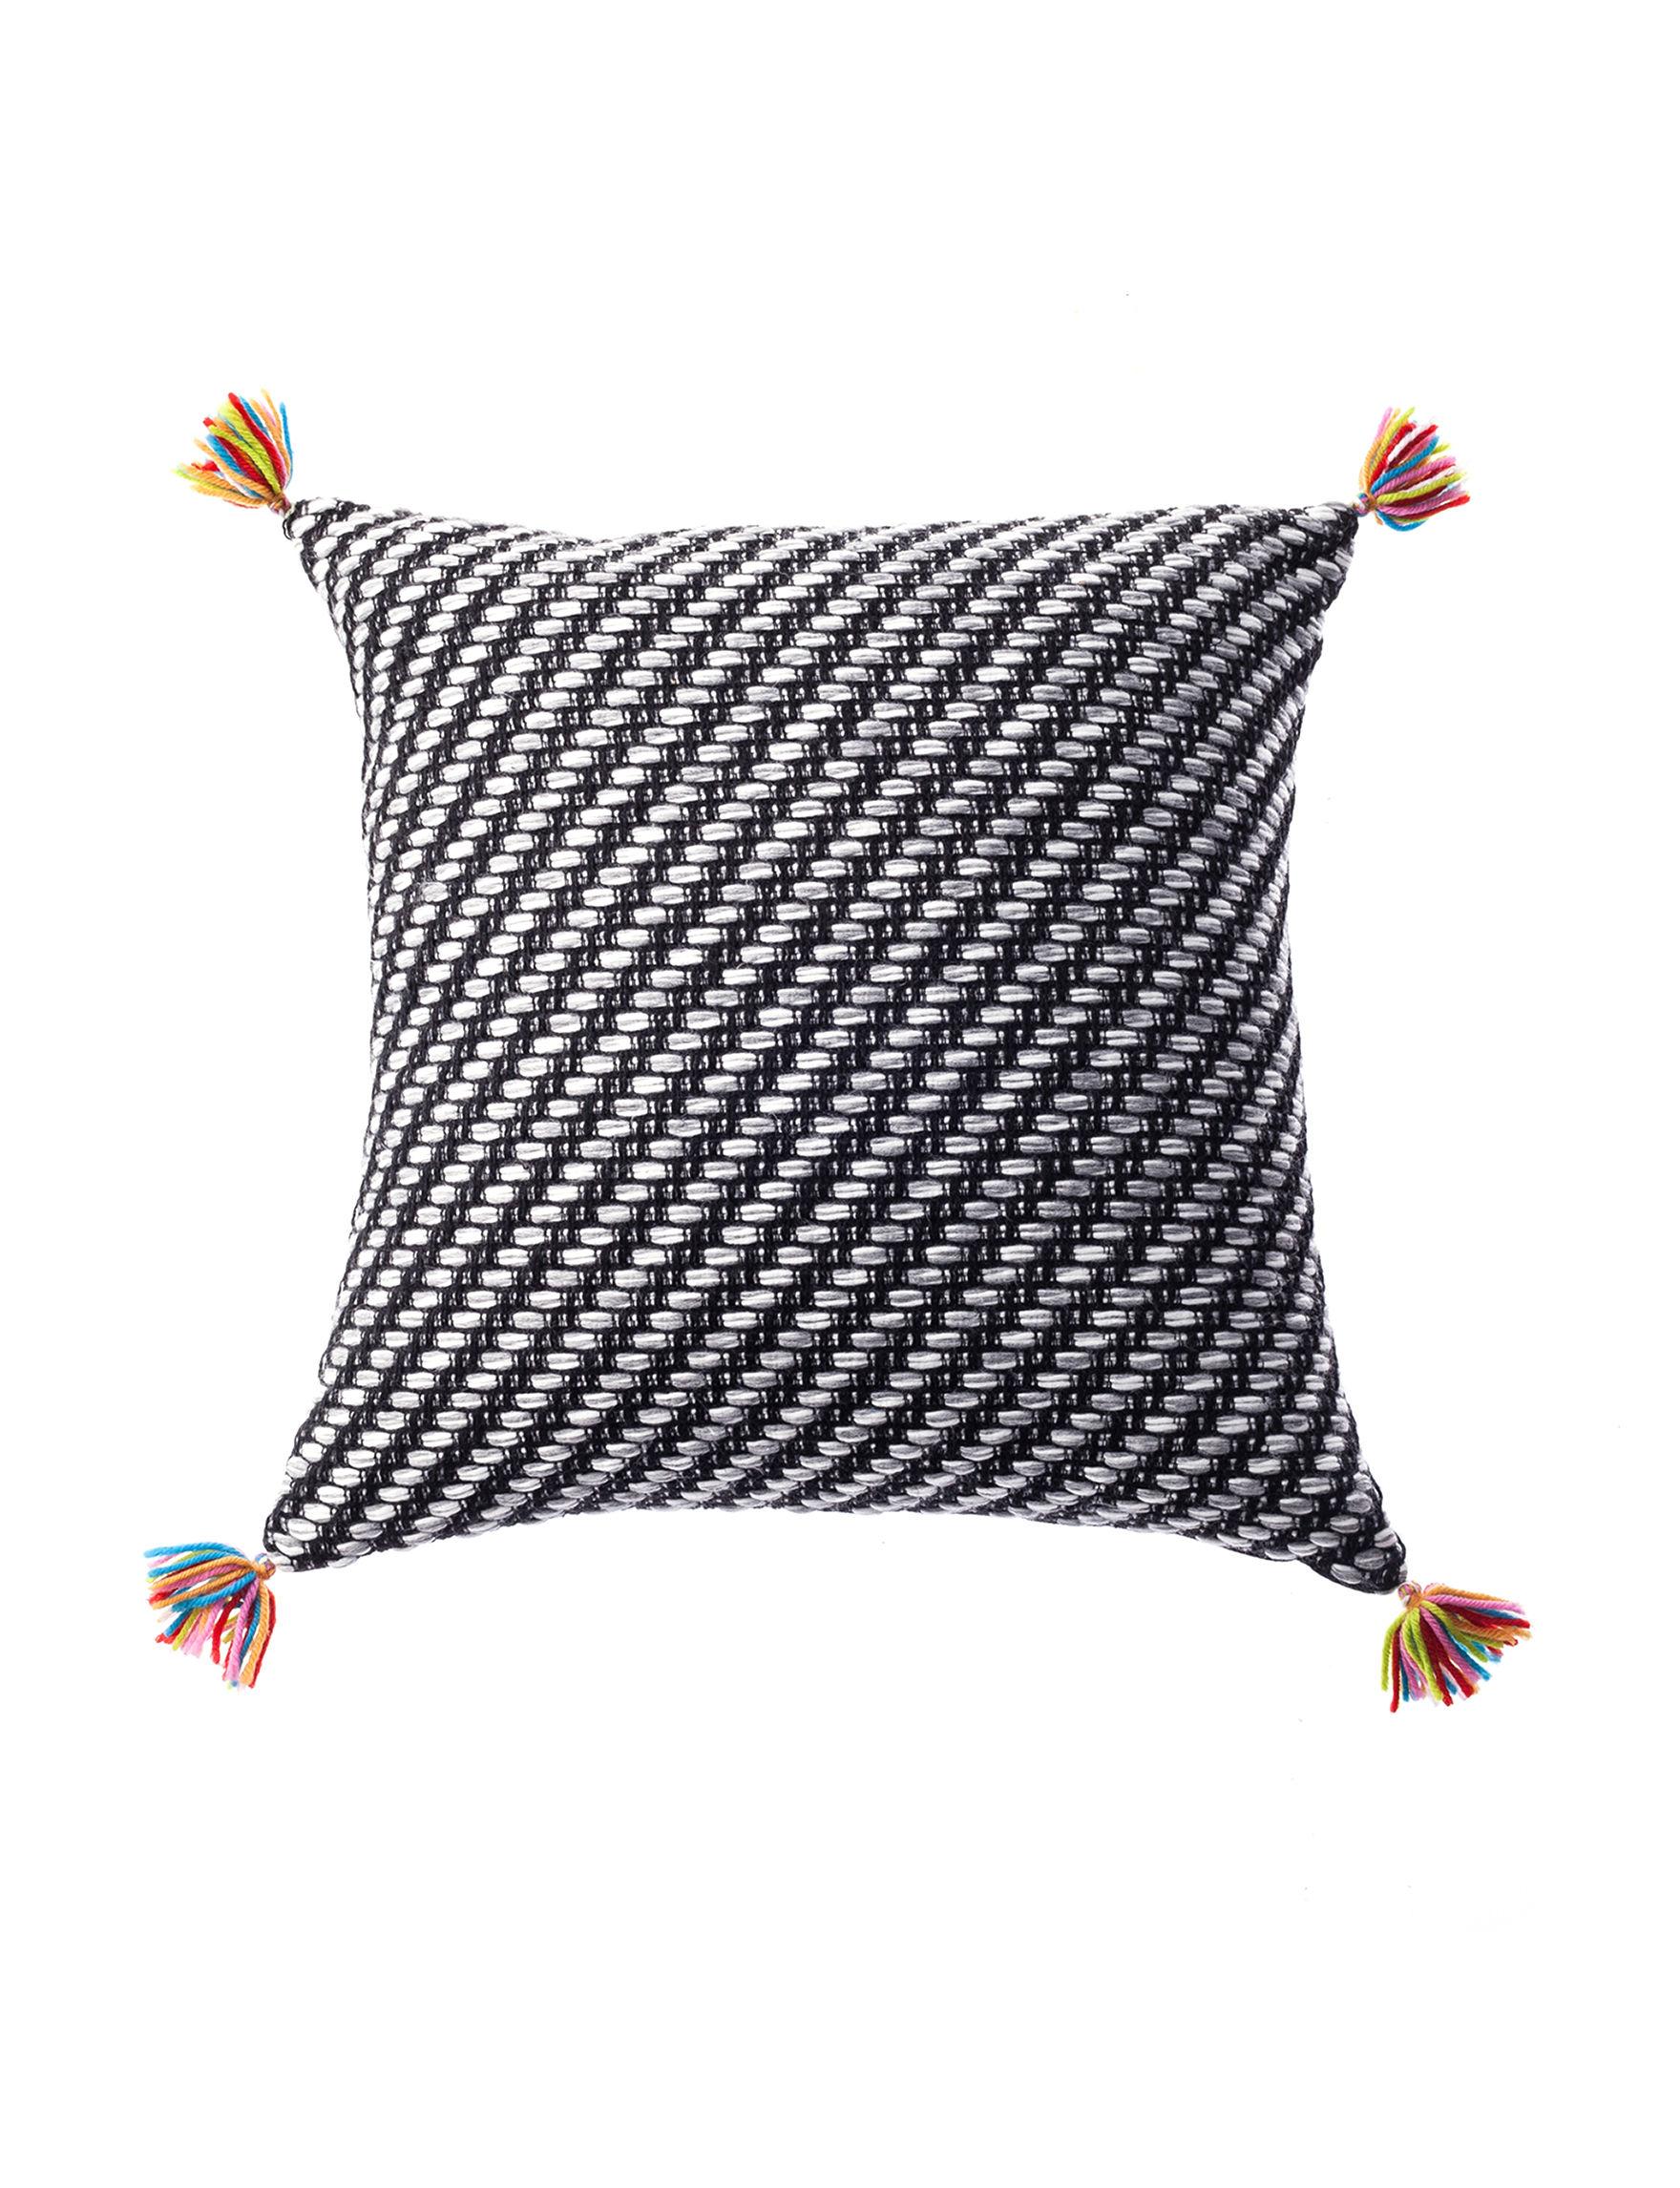 Deco Black Decorative Pillows